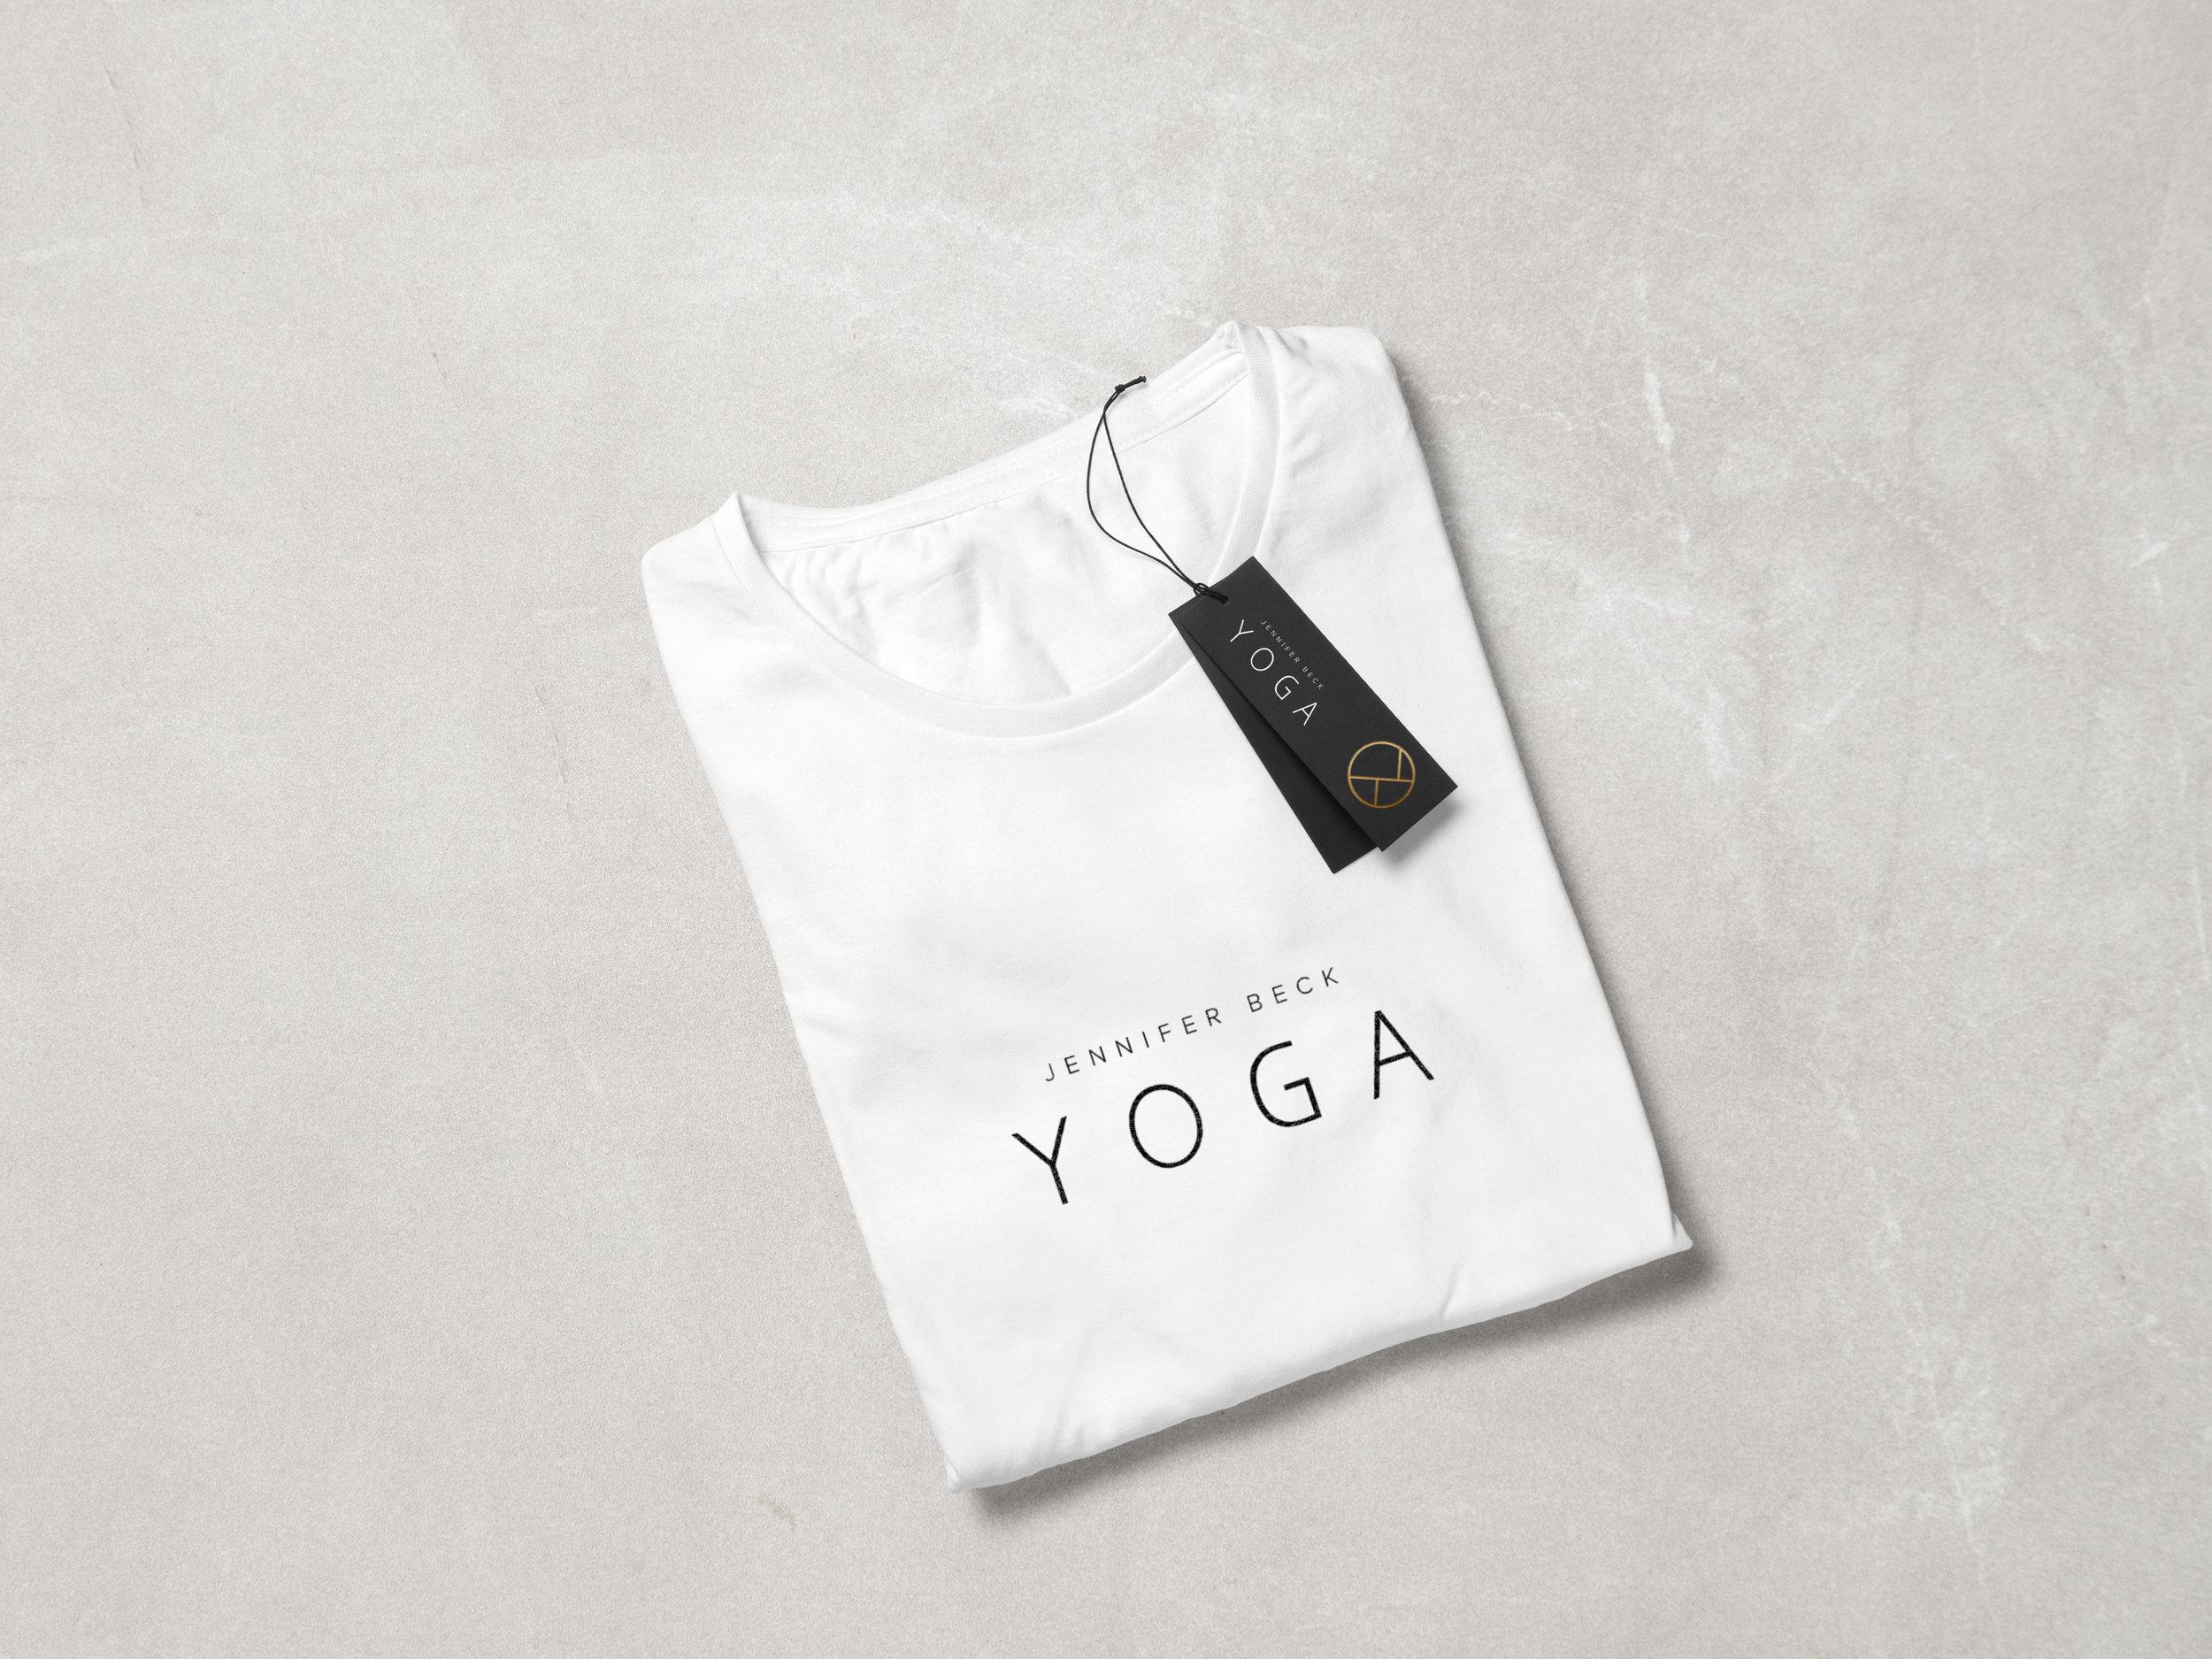 Yoga Branding and T-Shirt Design